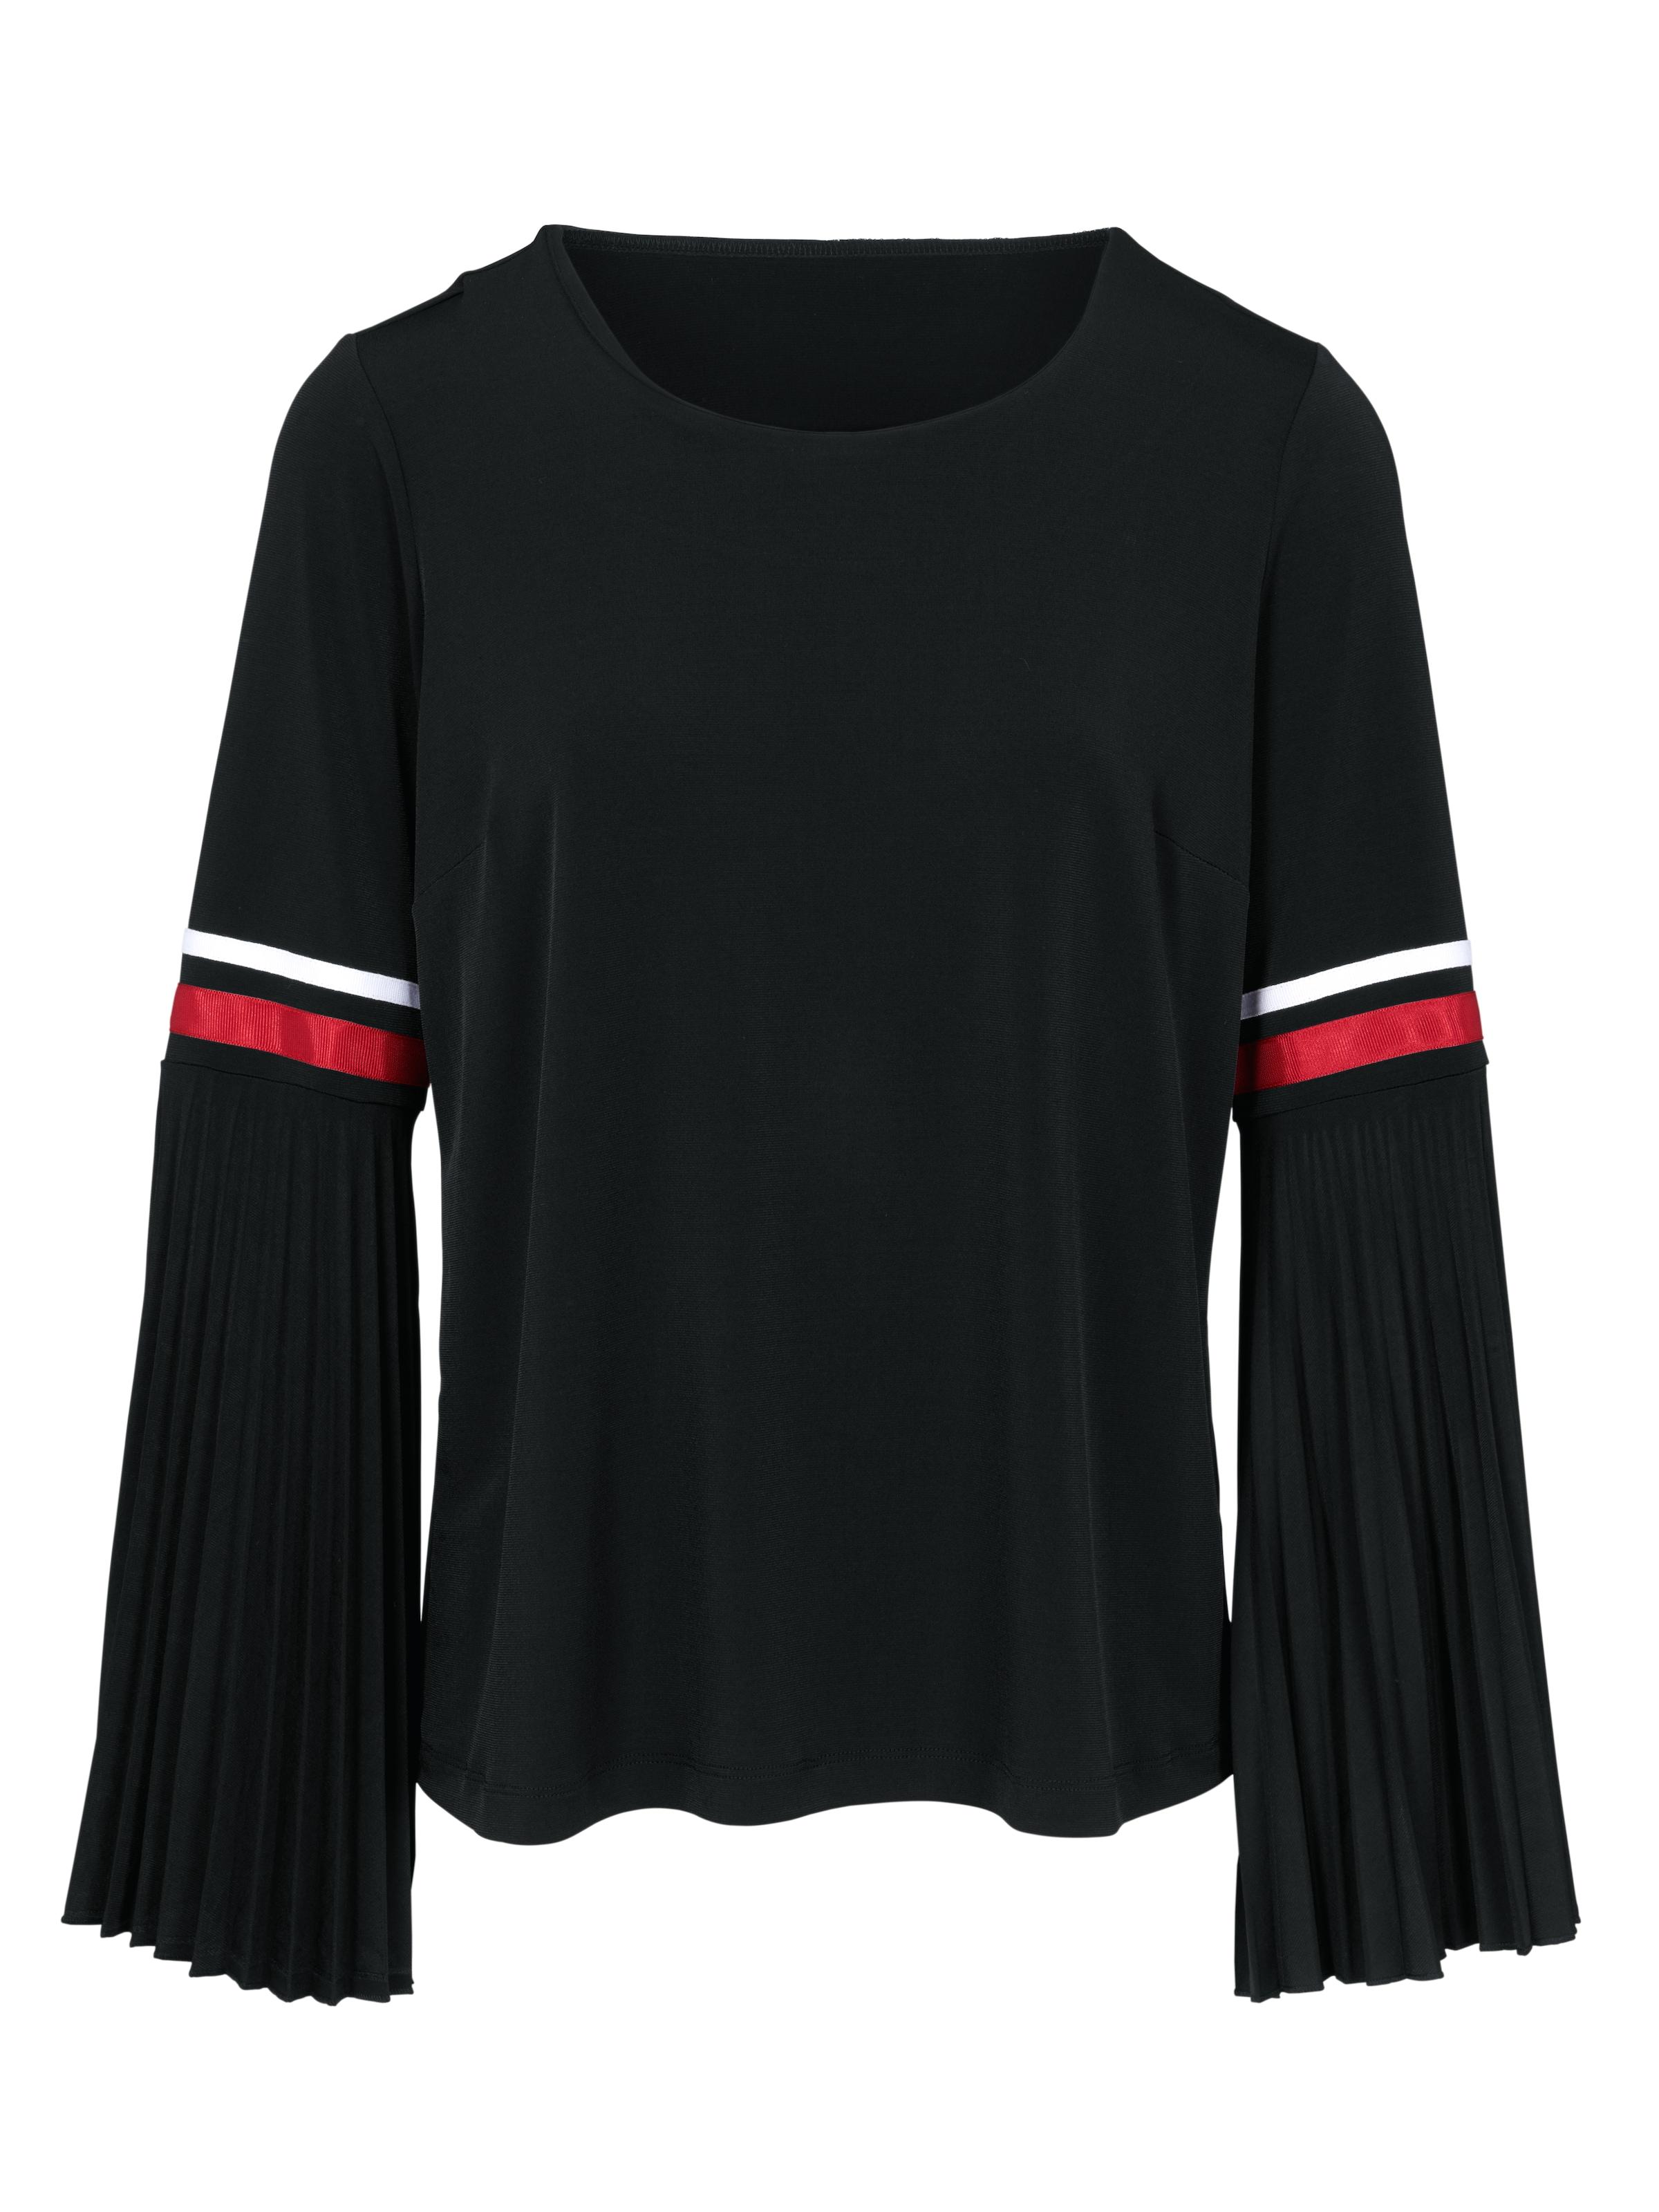 Heine Heine Noir Heine T Noir shirt T En En shirt L5Aj4R